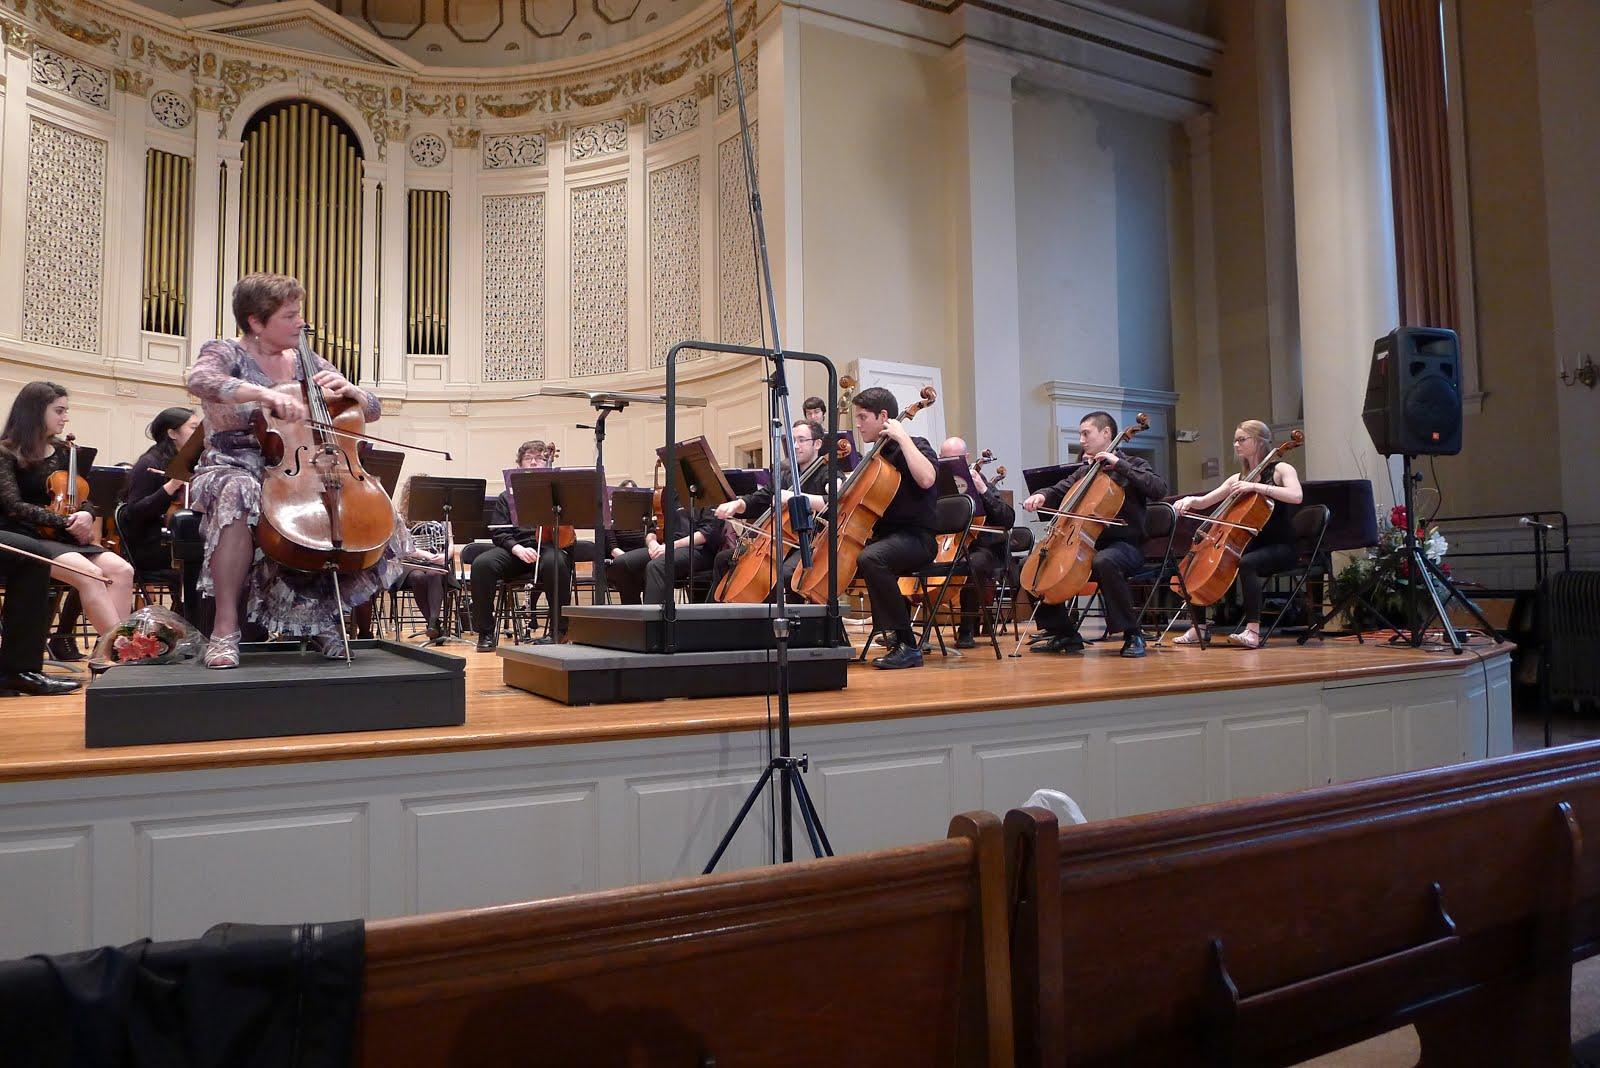 Denison University Orchestra